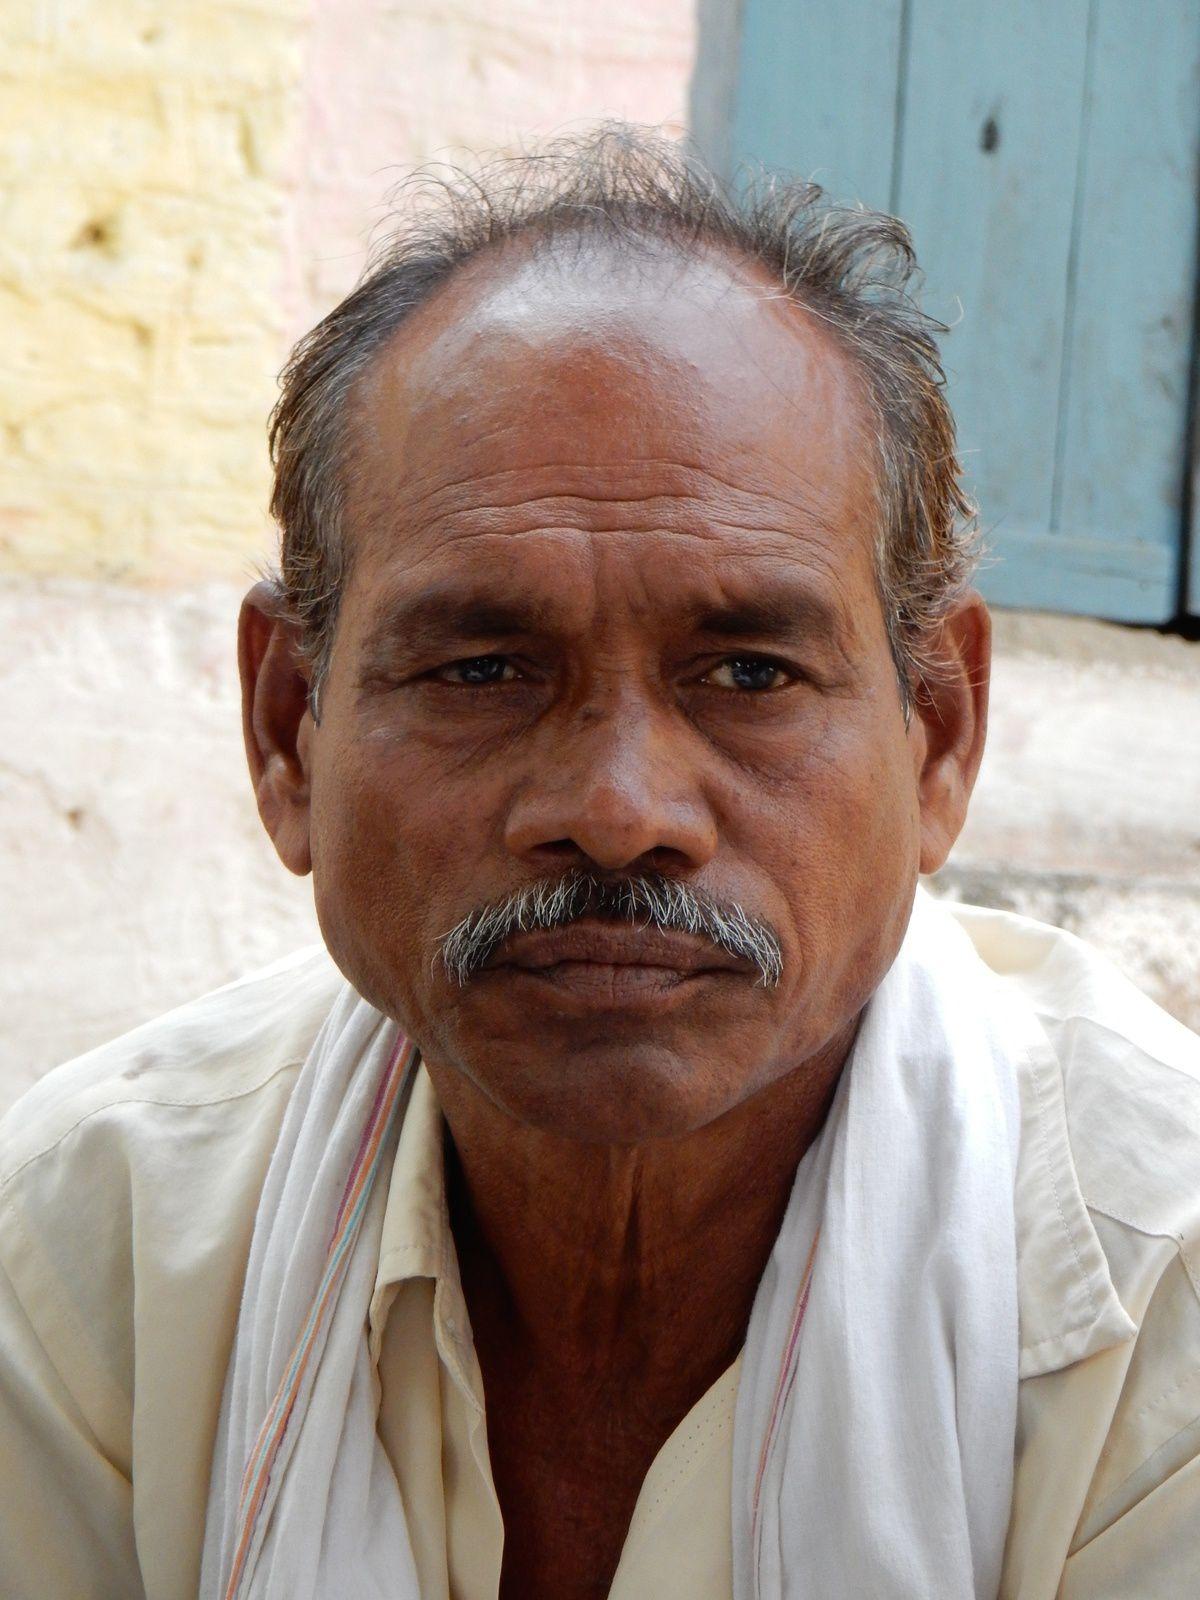 Palasur, Madhya Pradesh - Juin 2014